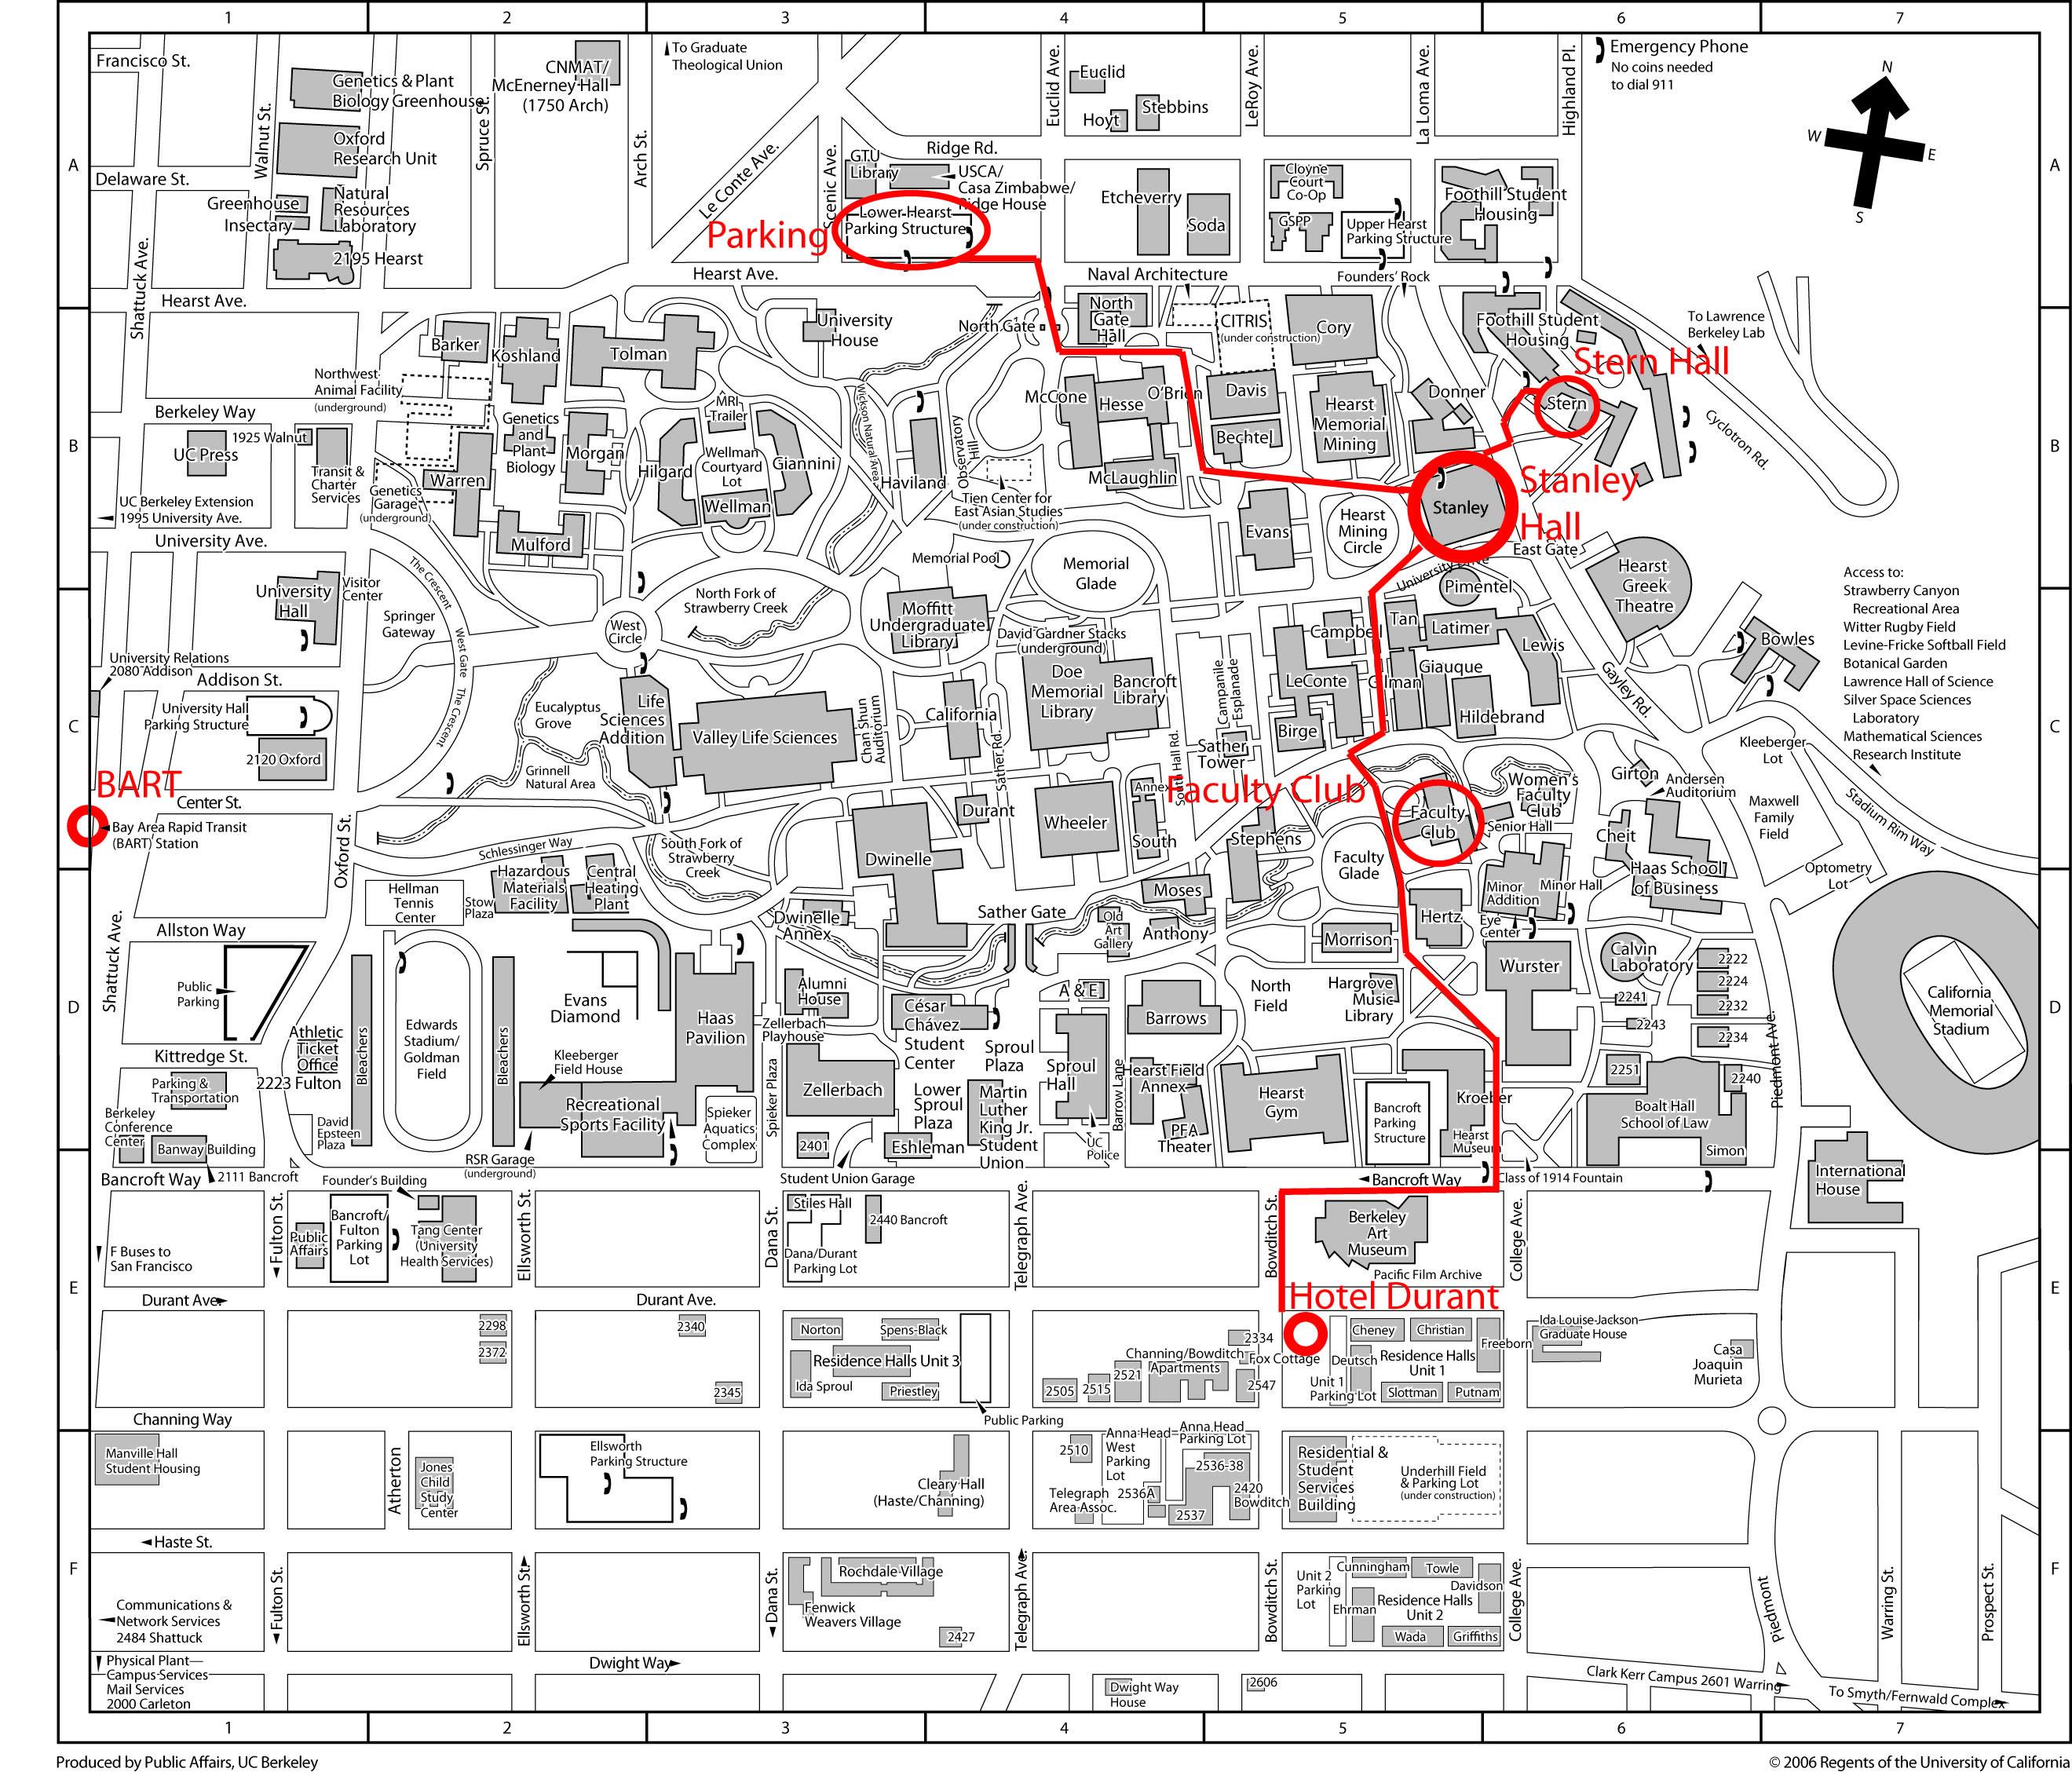 map of berkeley campus Ishhc Xiii July 16 20 2007 Directions map of berkeley campus